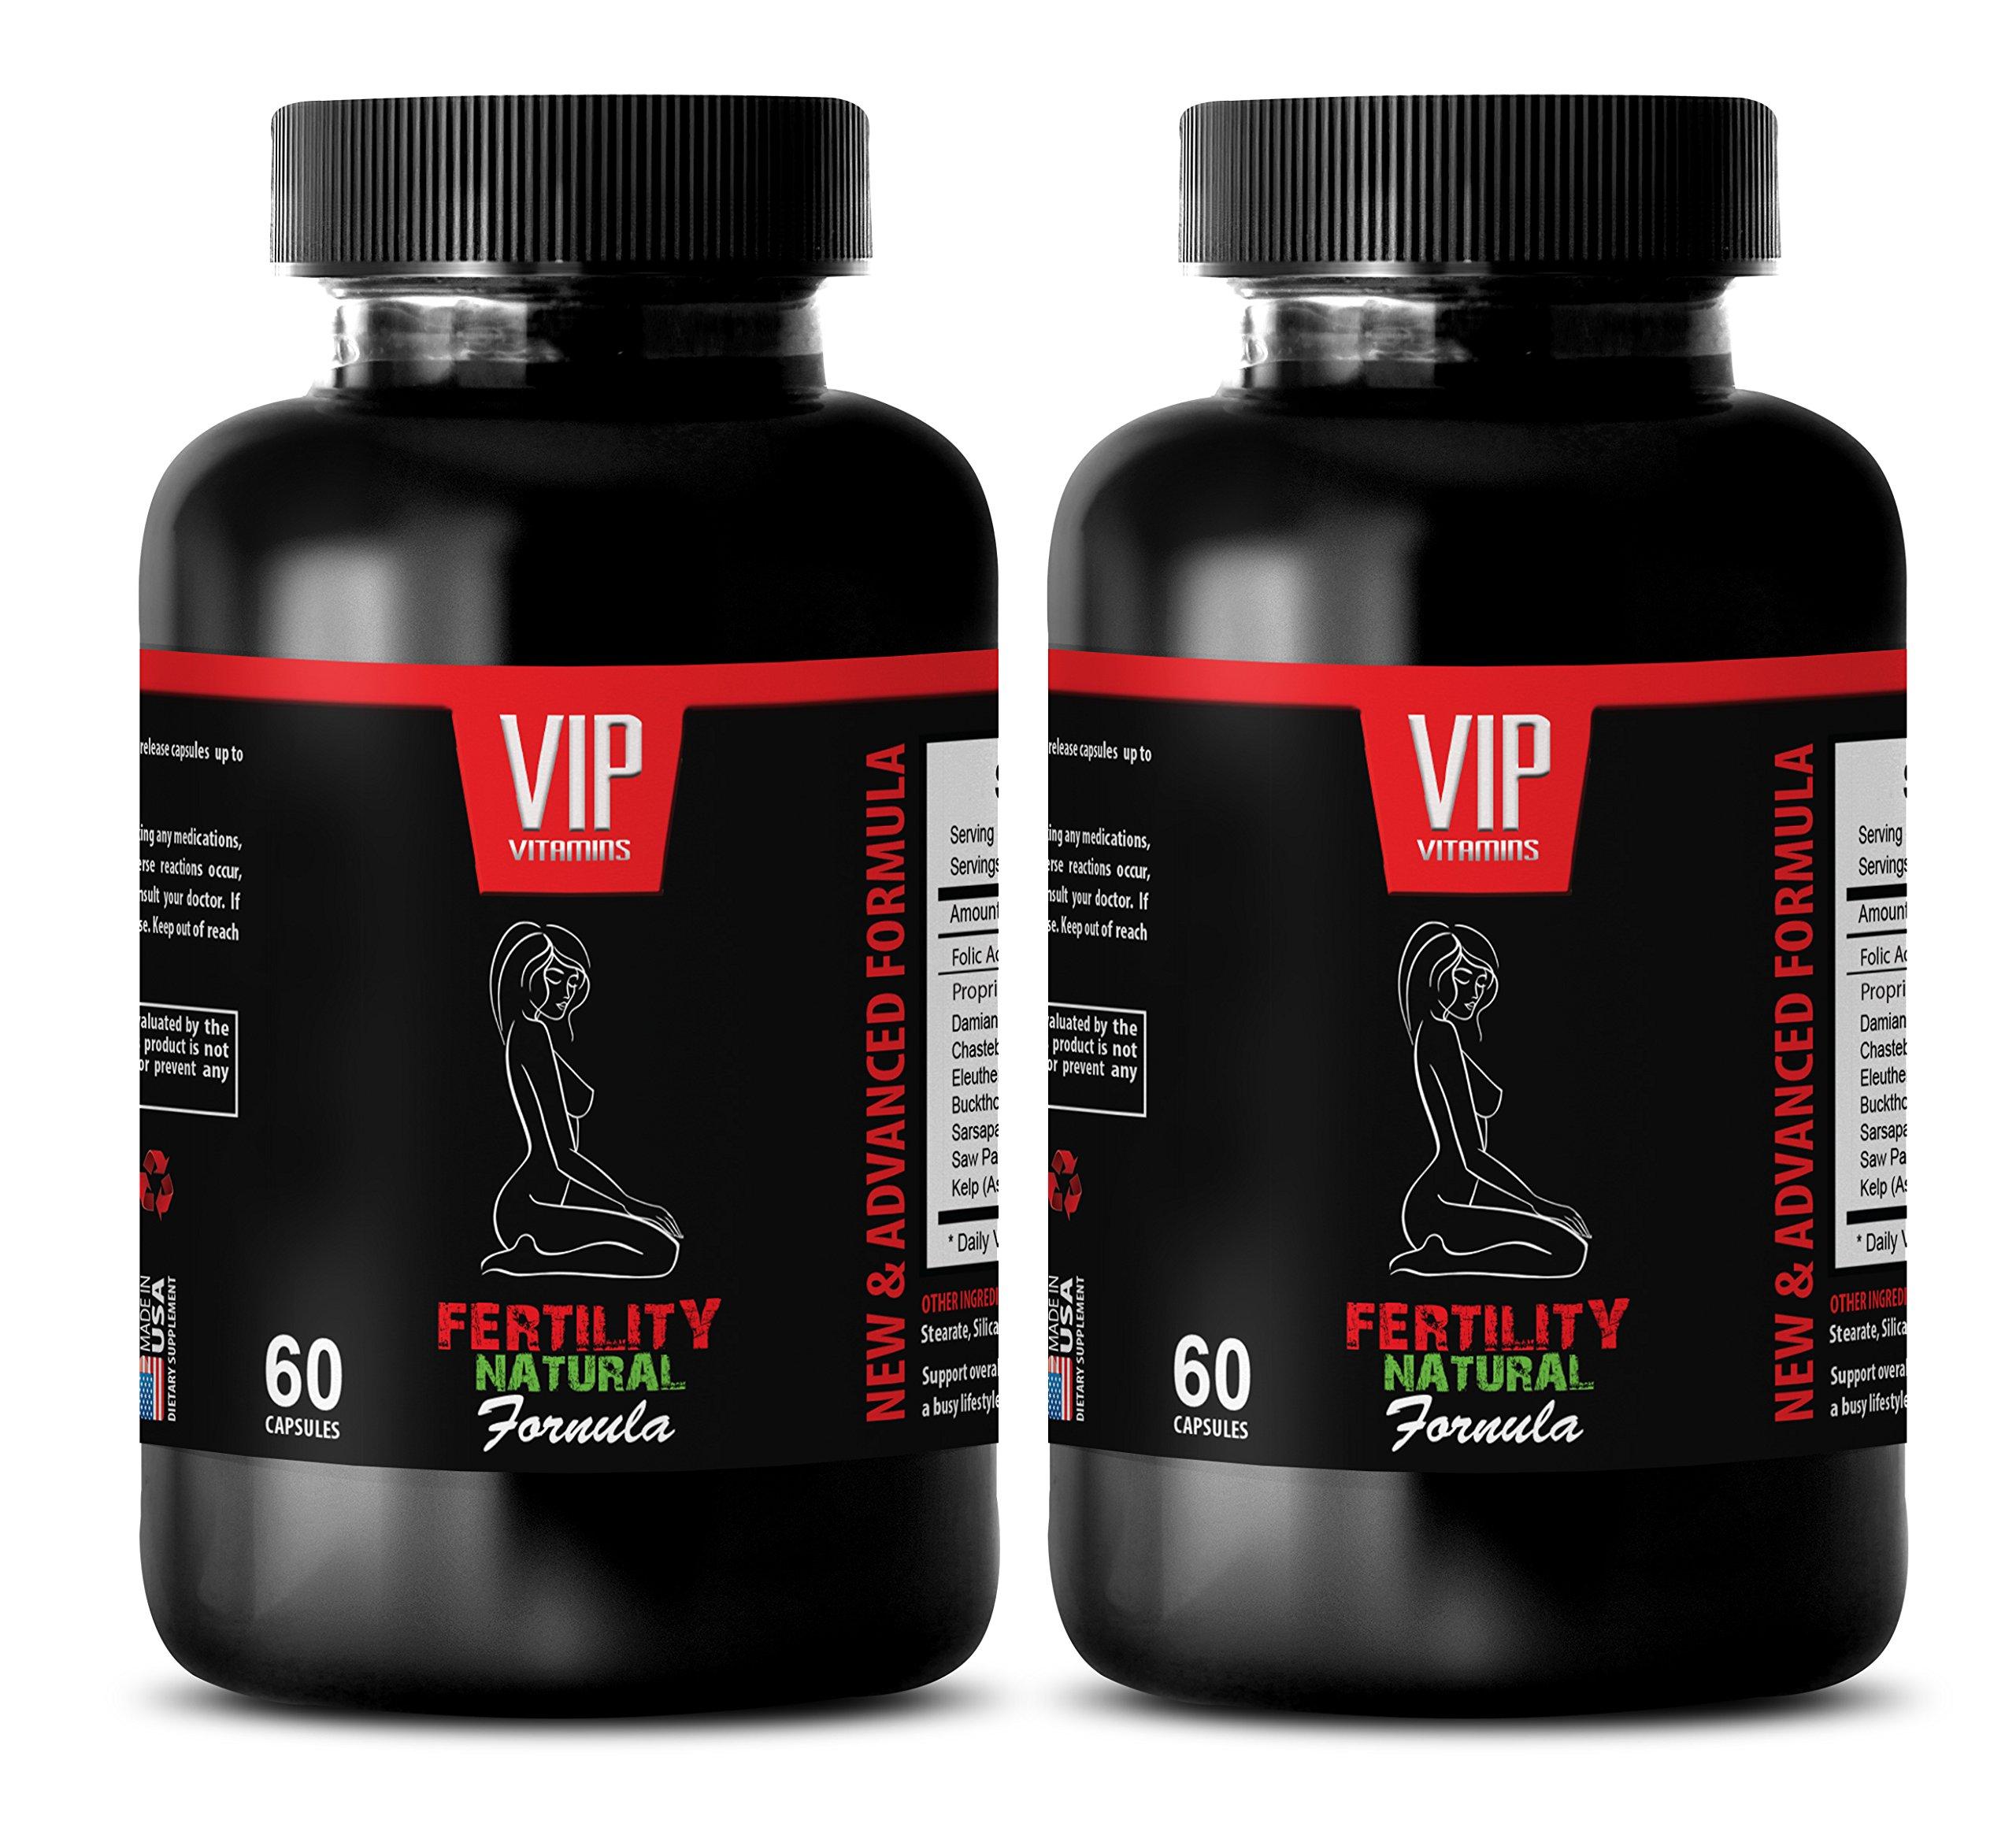 increase sexual desire for women - FERTILITY NATURAL FORMULA - damiana bulk supplements - 2 Bottles 120 Capsules